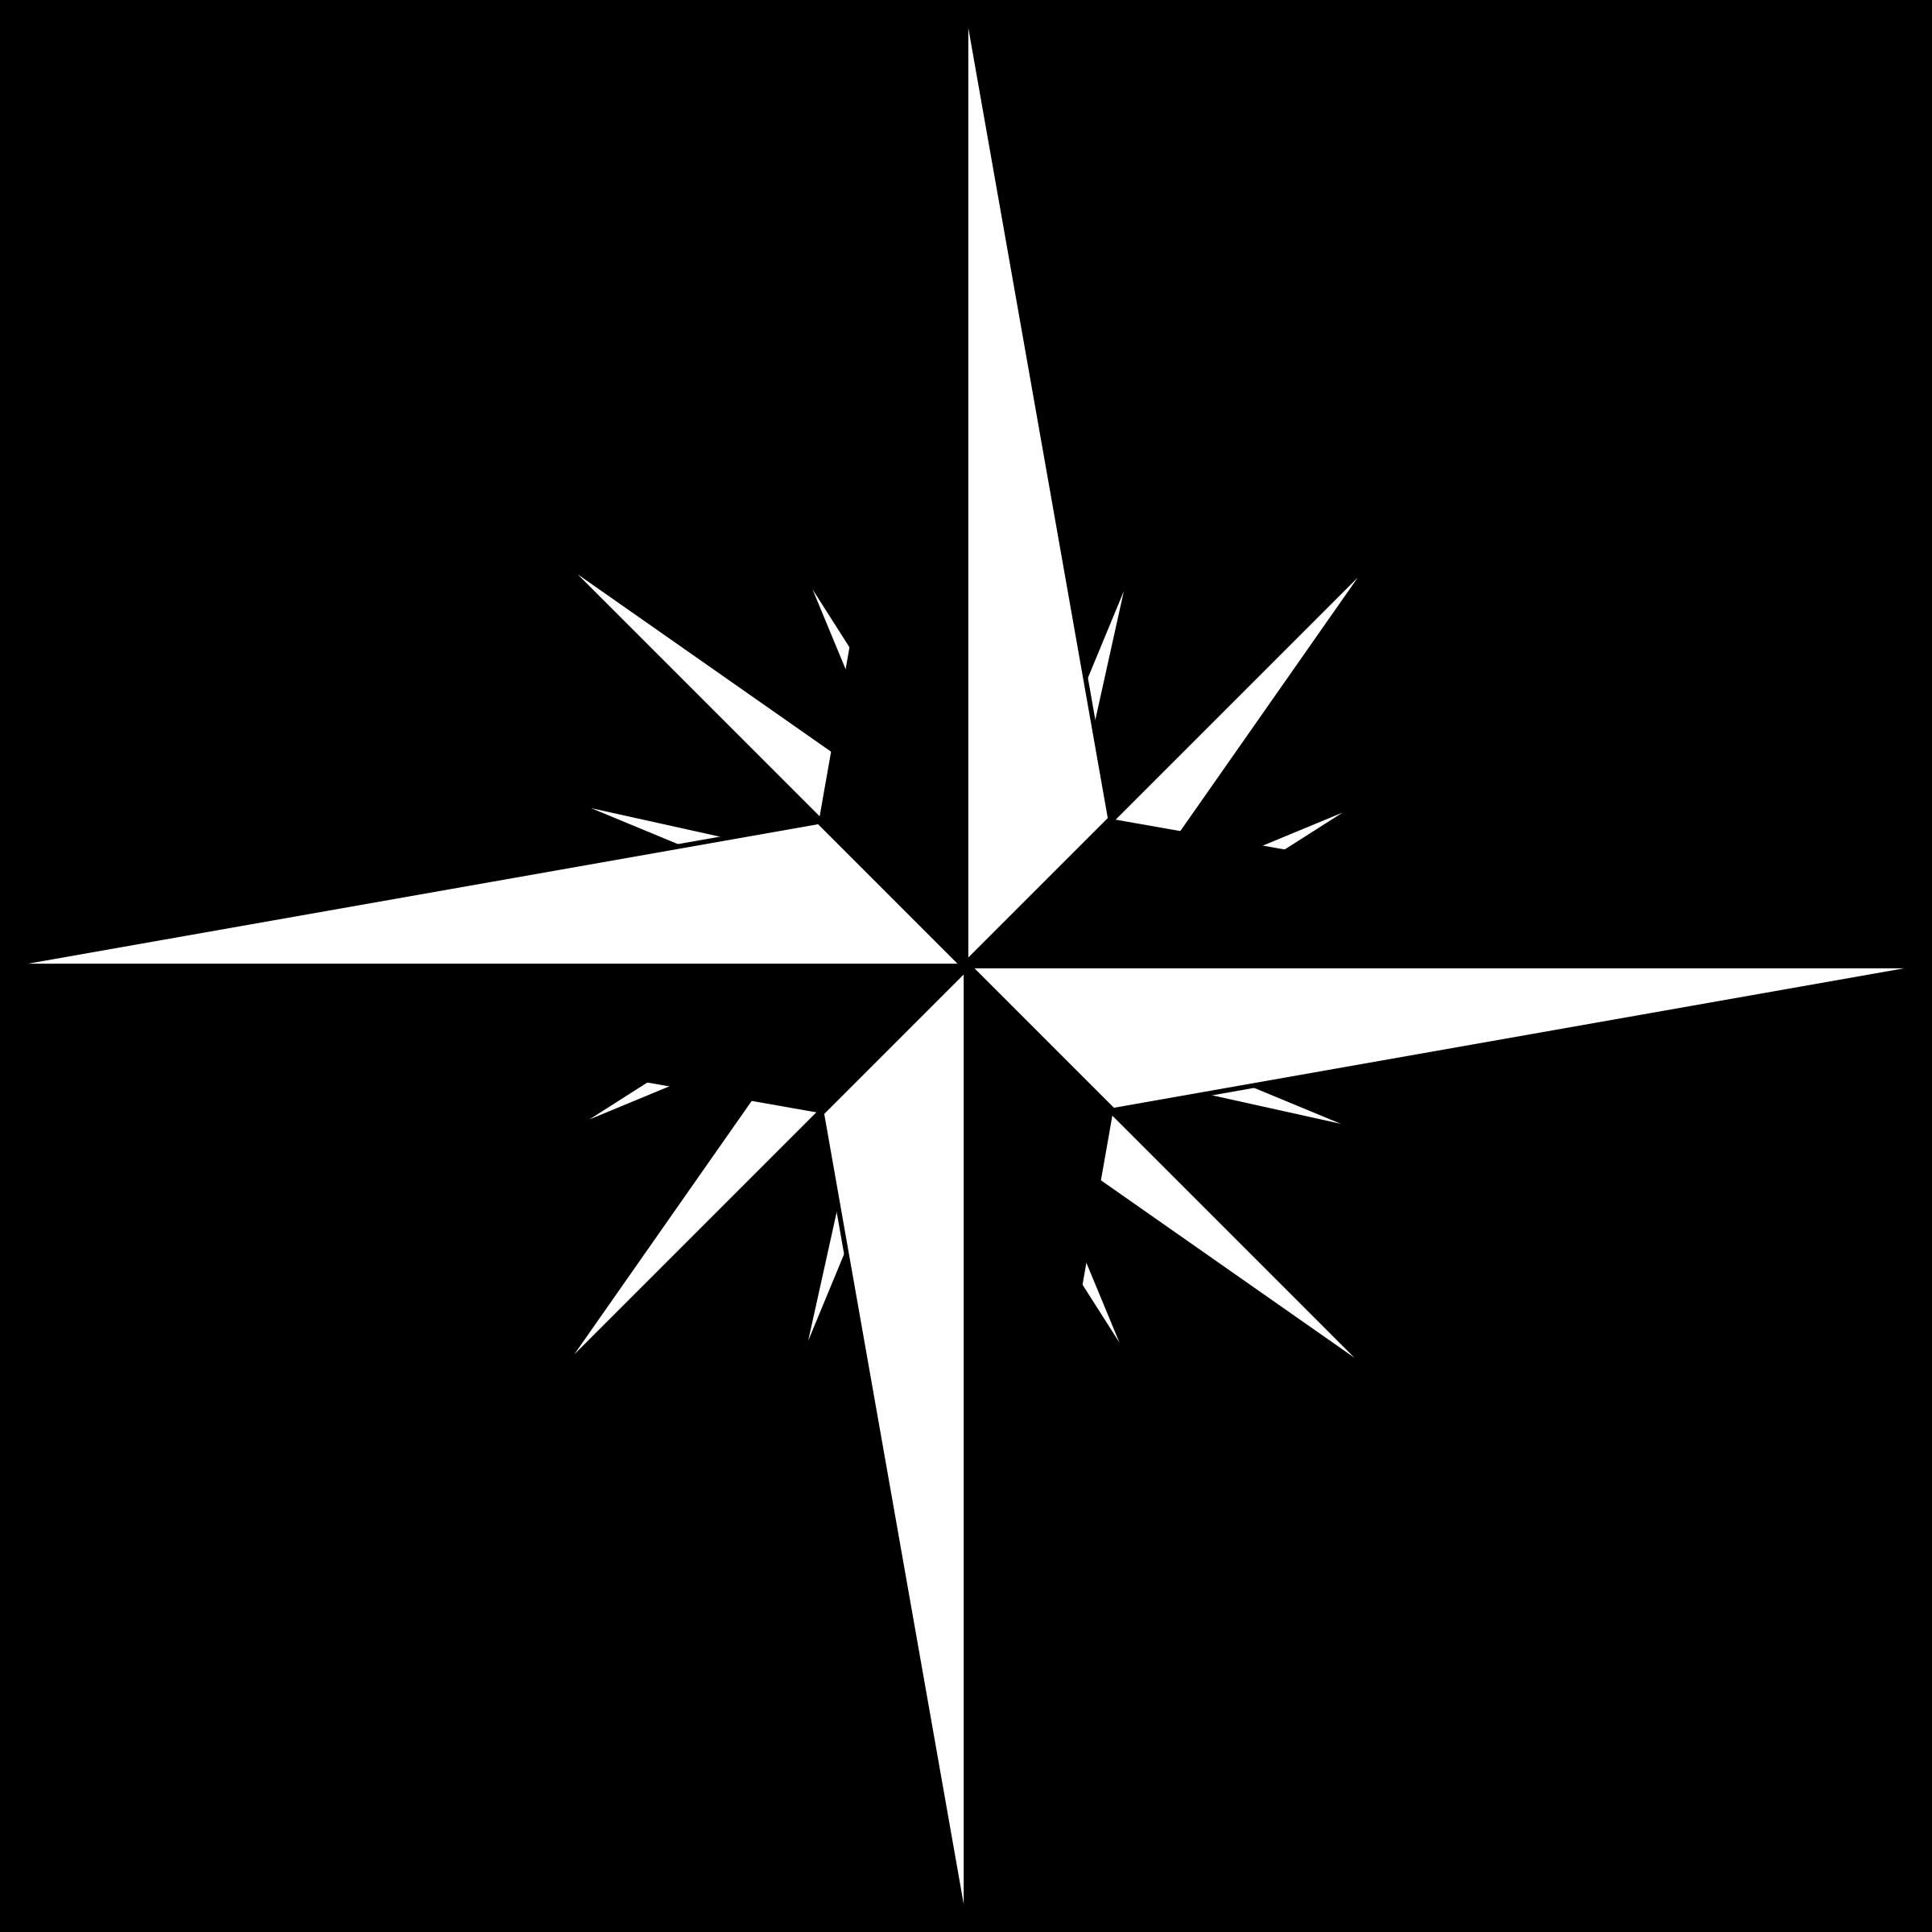 compass rose vector clipart image free stock photo public domain rh goodfreephotos com compass vector free download compass vector free